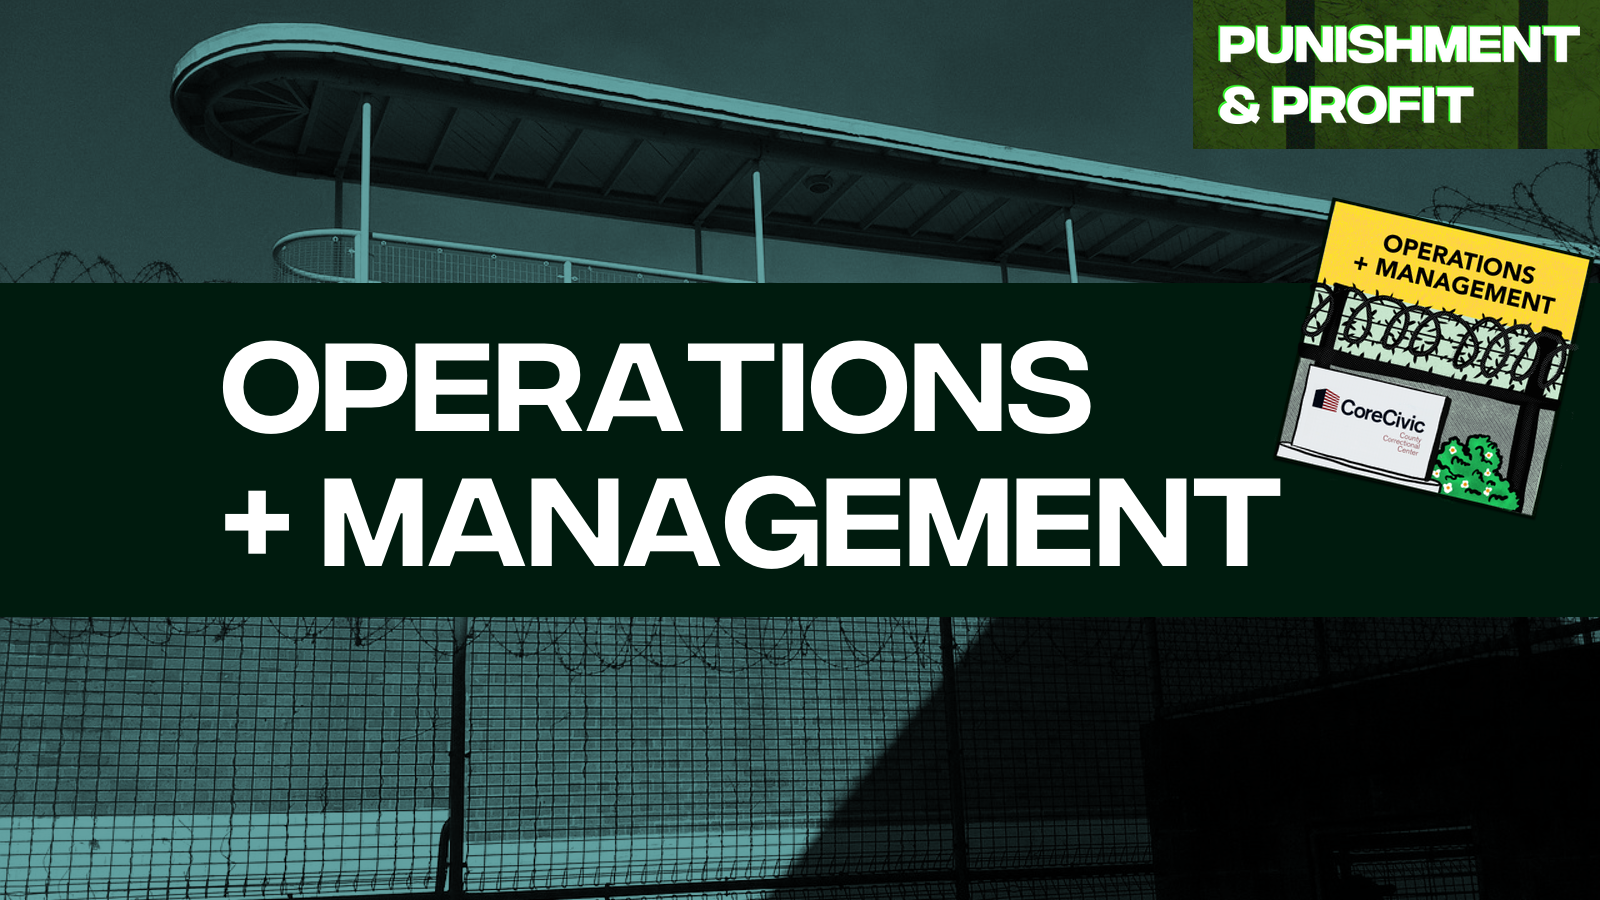 Punishment & Profit: Operations & Management